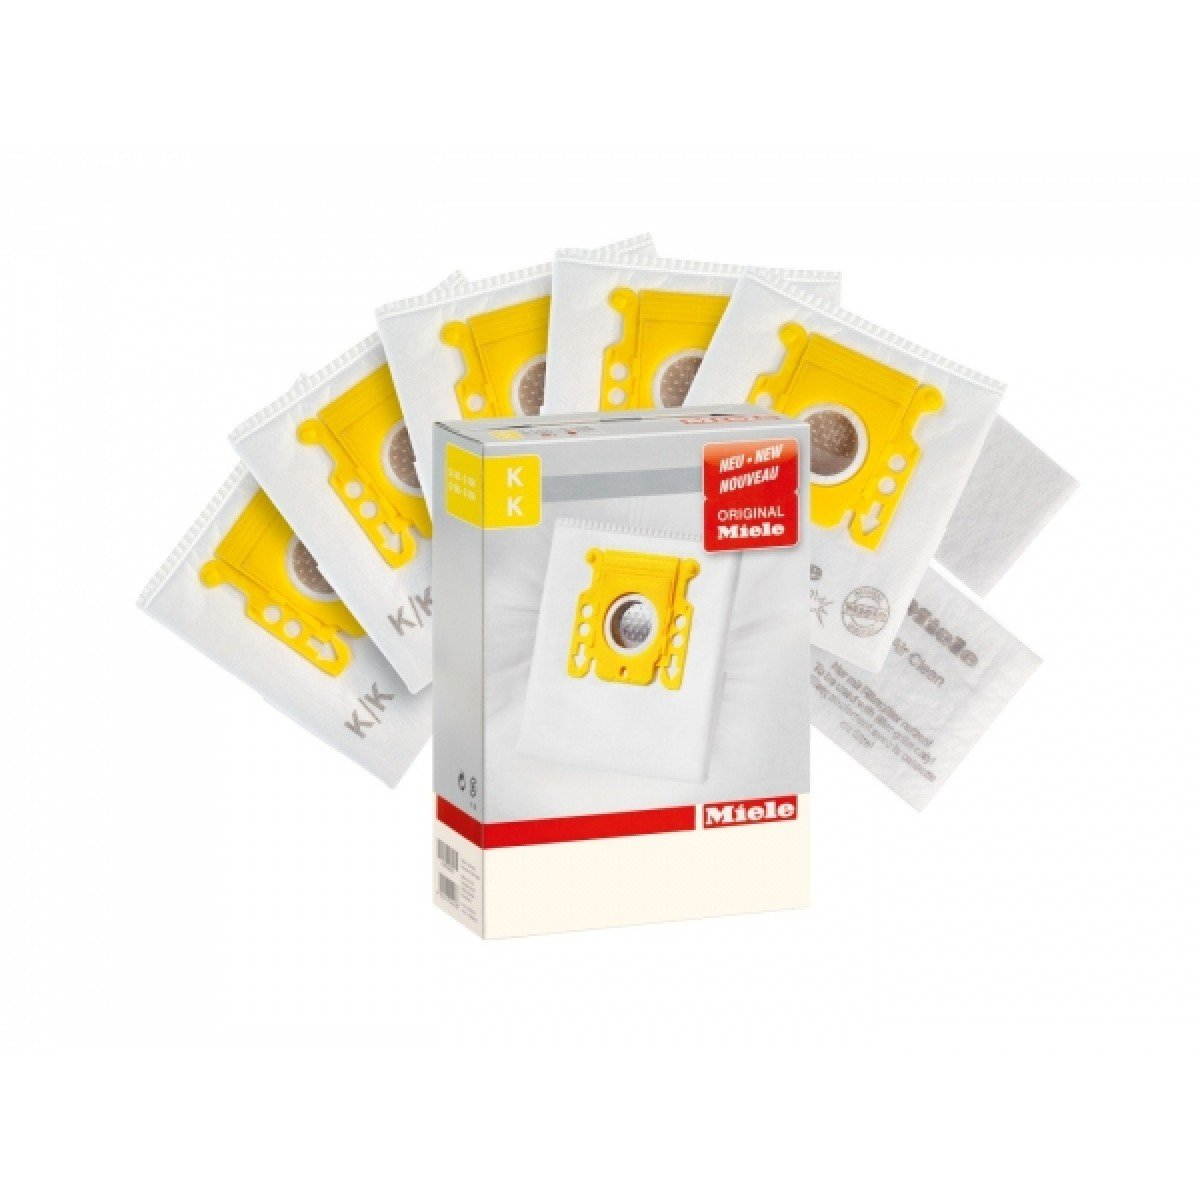 Miele KK Bags - AirClean 3D Efficiency Filter